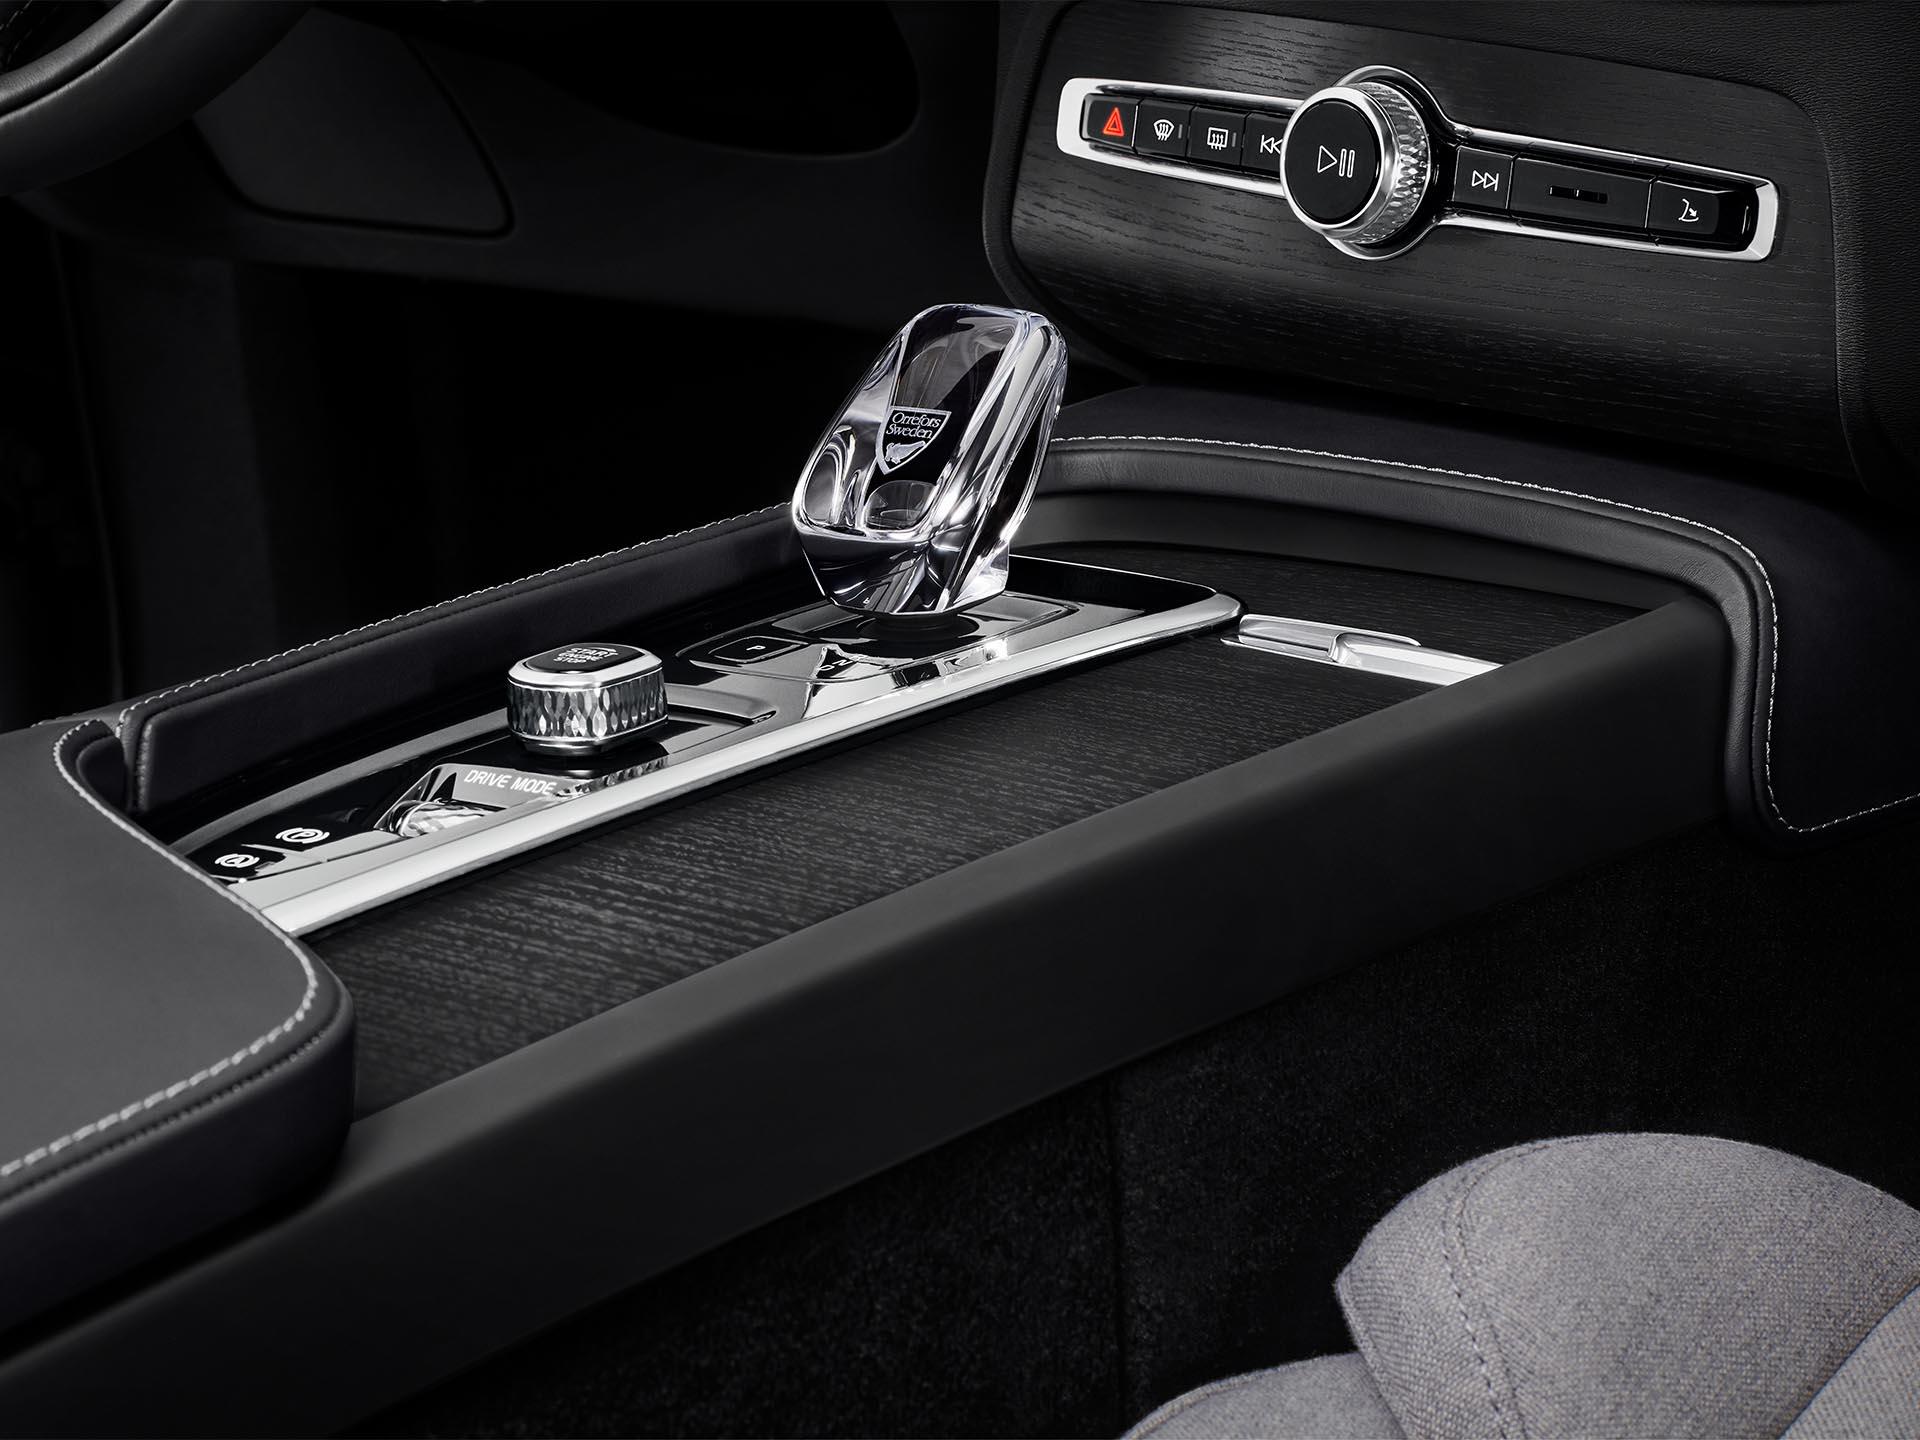 Inside a Volvo SUV, a crystal gear shifter